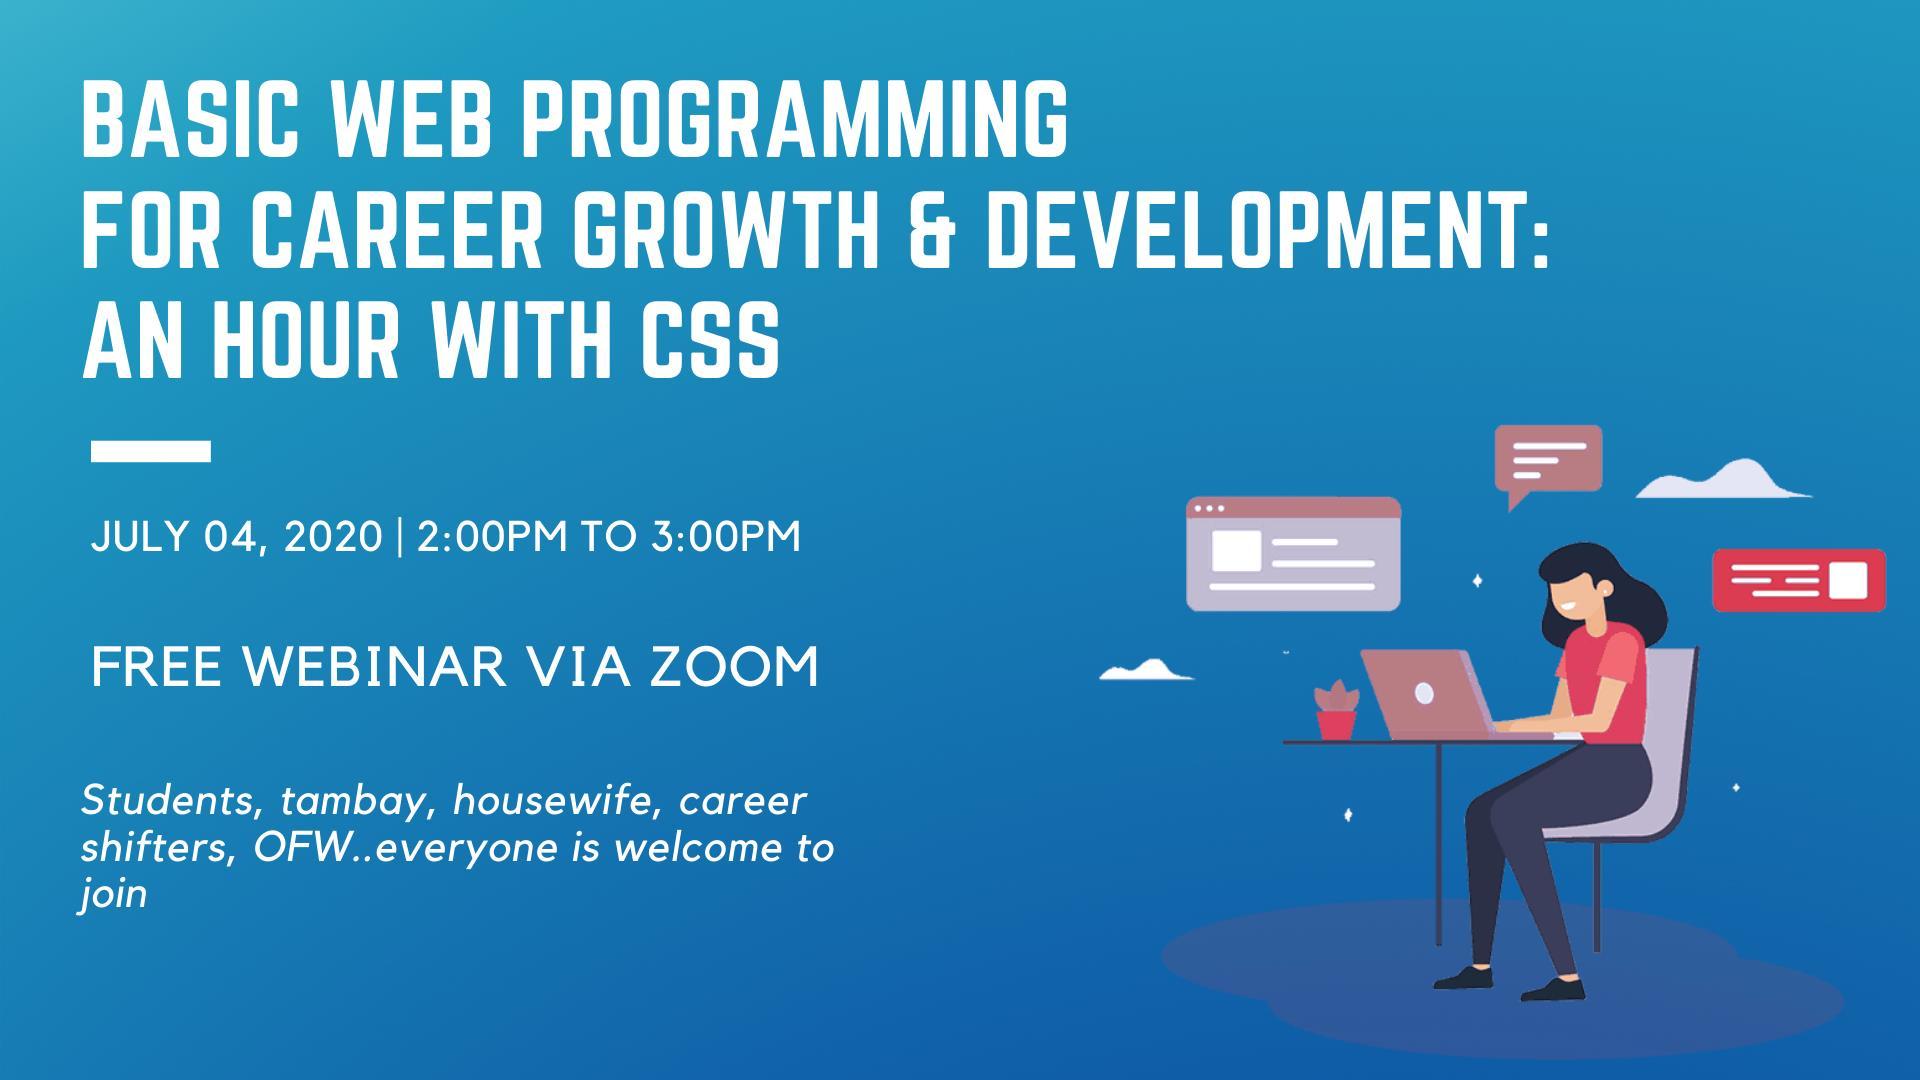 Basic Web Programming for Career Growth & Development: CSS